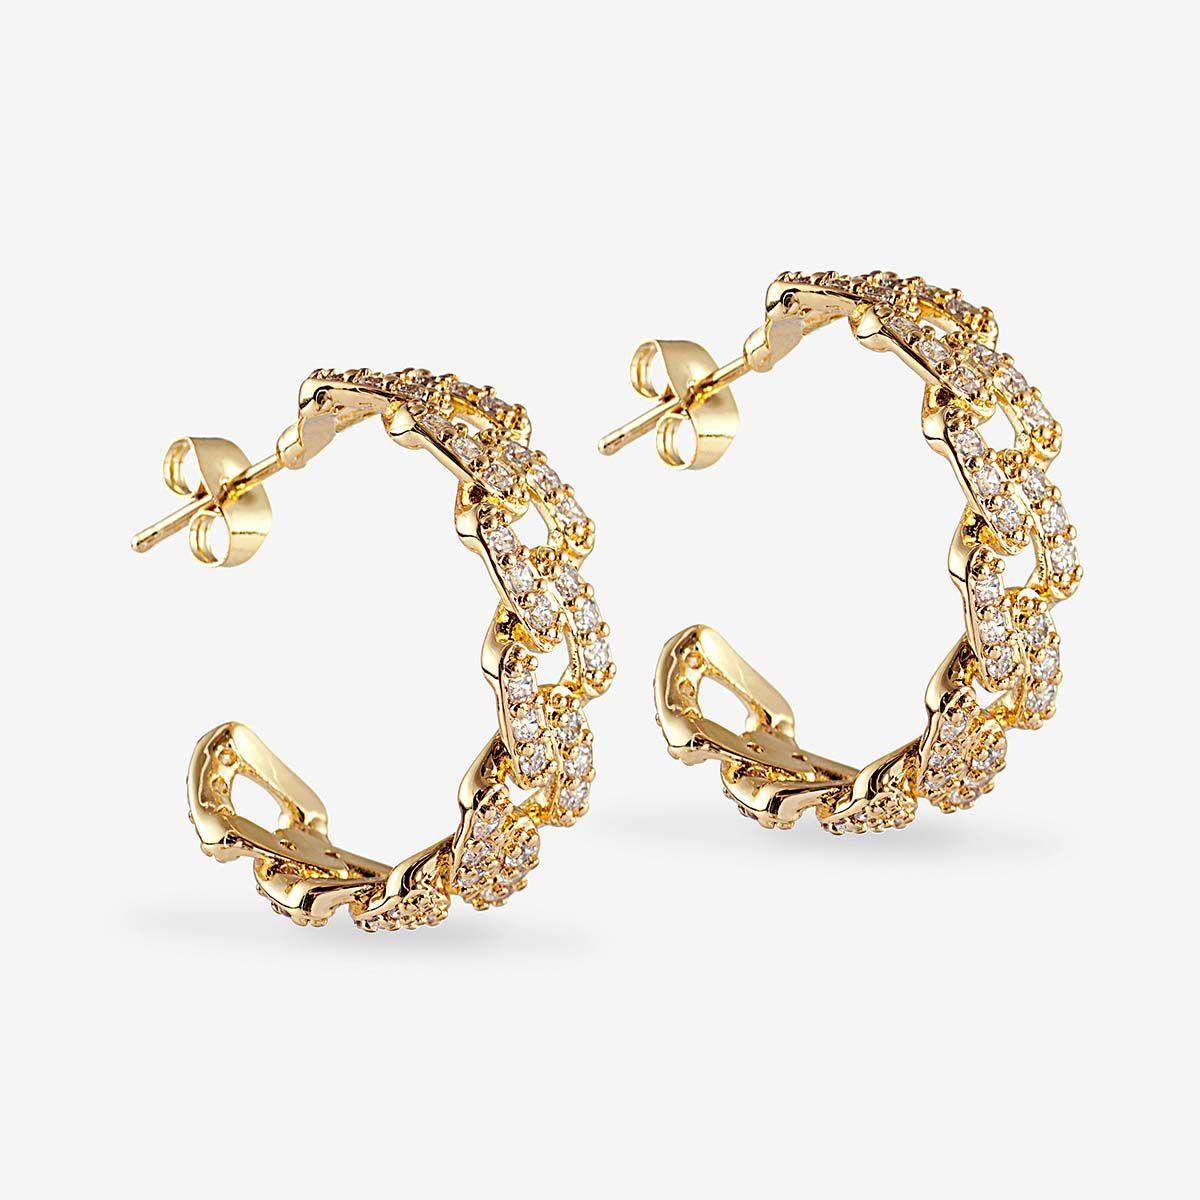 Mexican Chain Earrings - Ohrhänger - 18k vergoldet